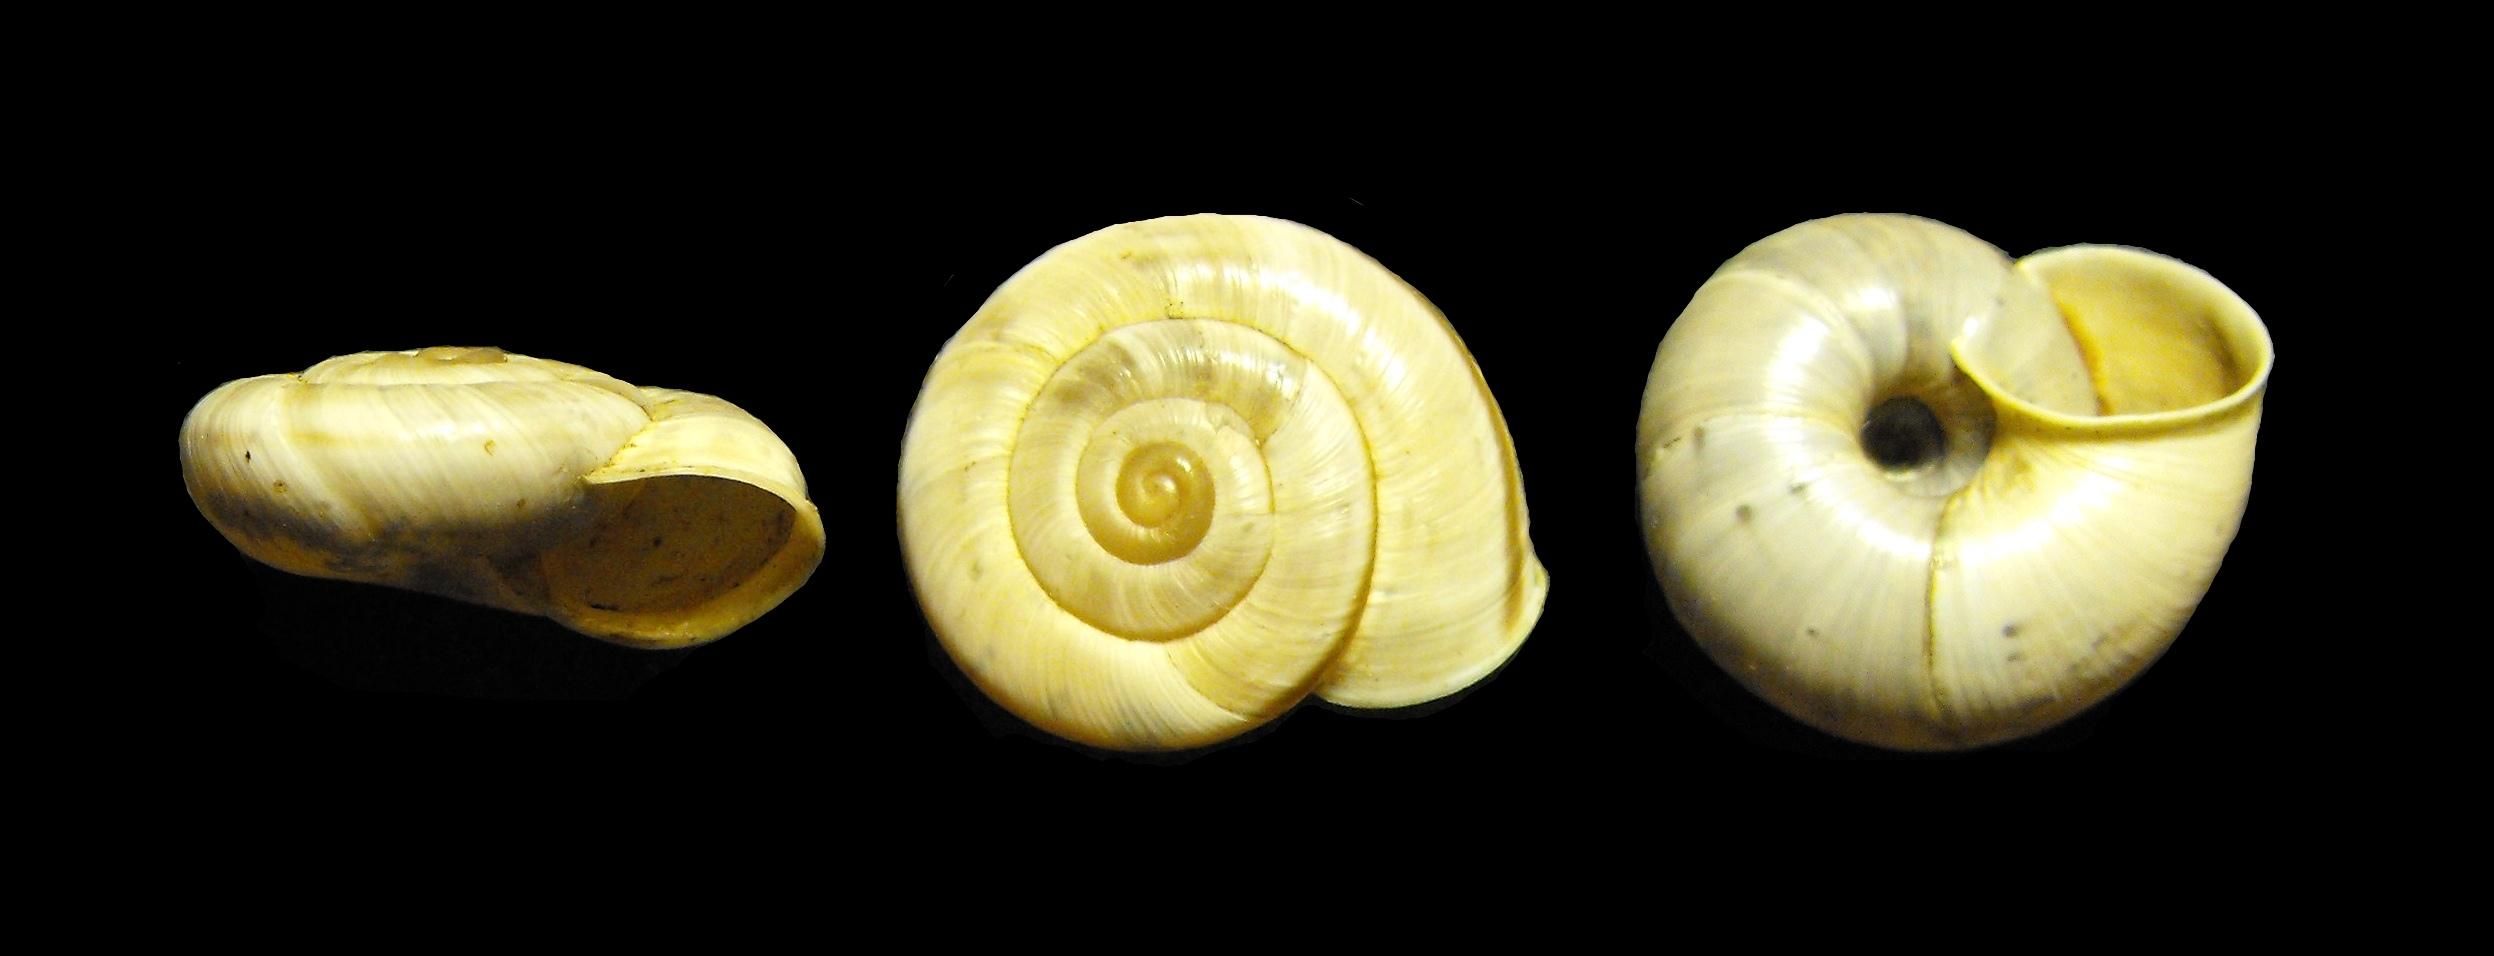 Chilostoma cingulatum nicatis (Costa, 1836)